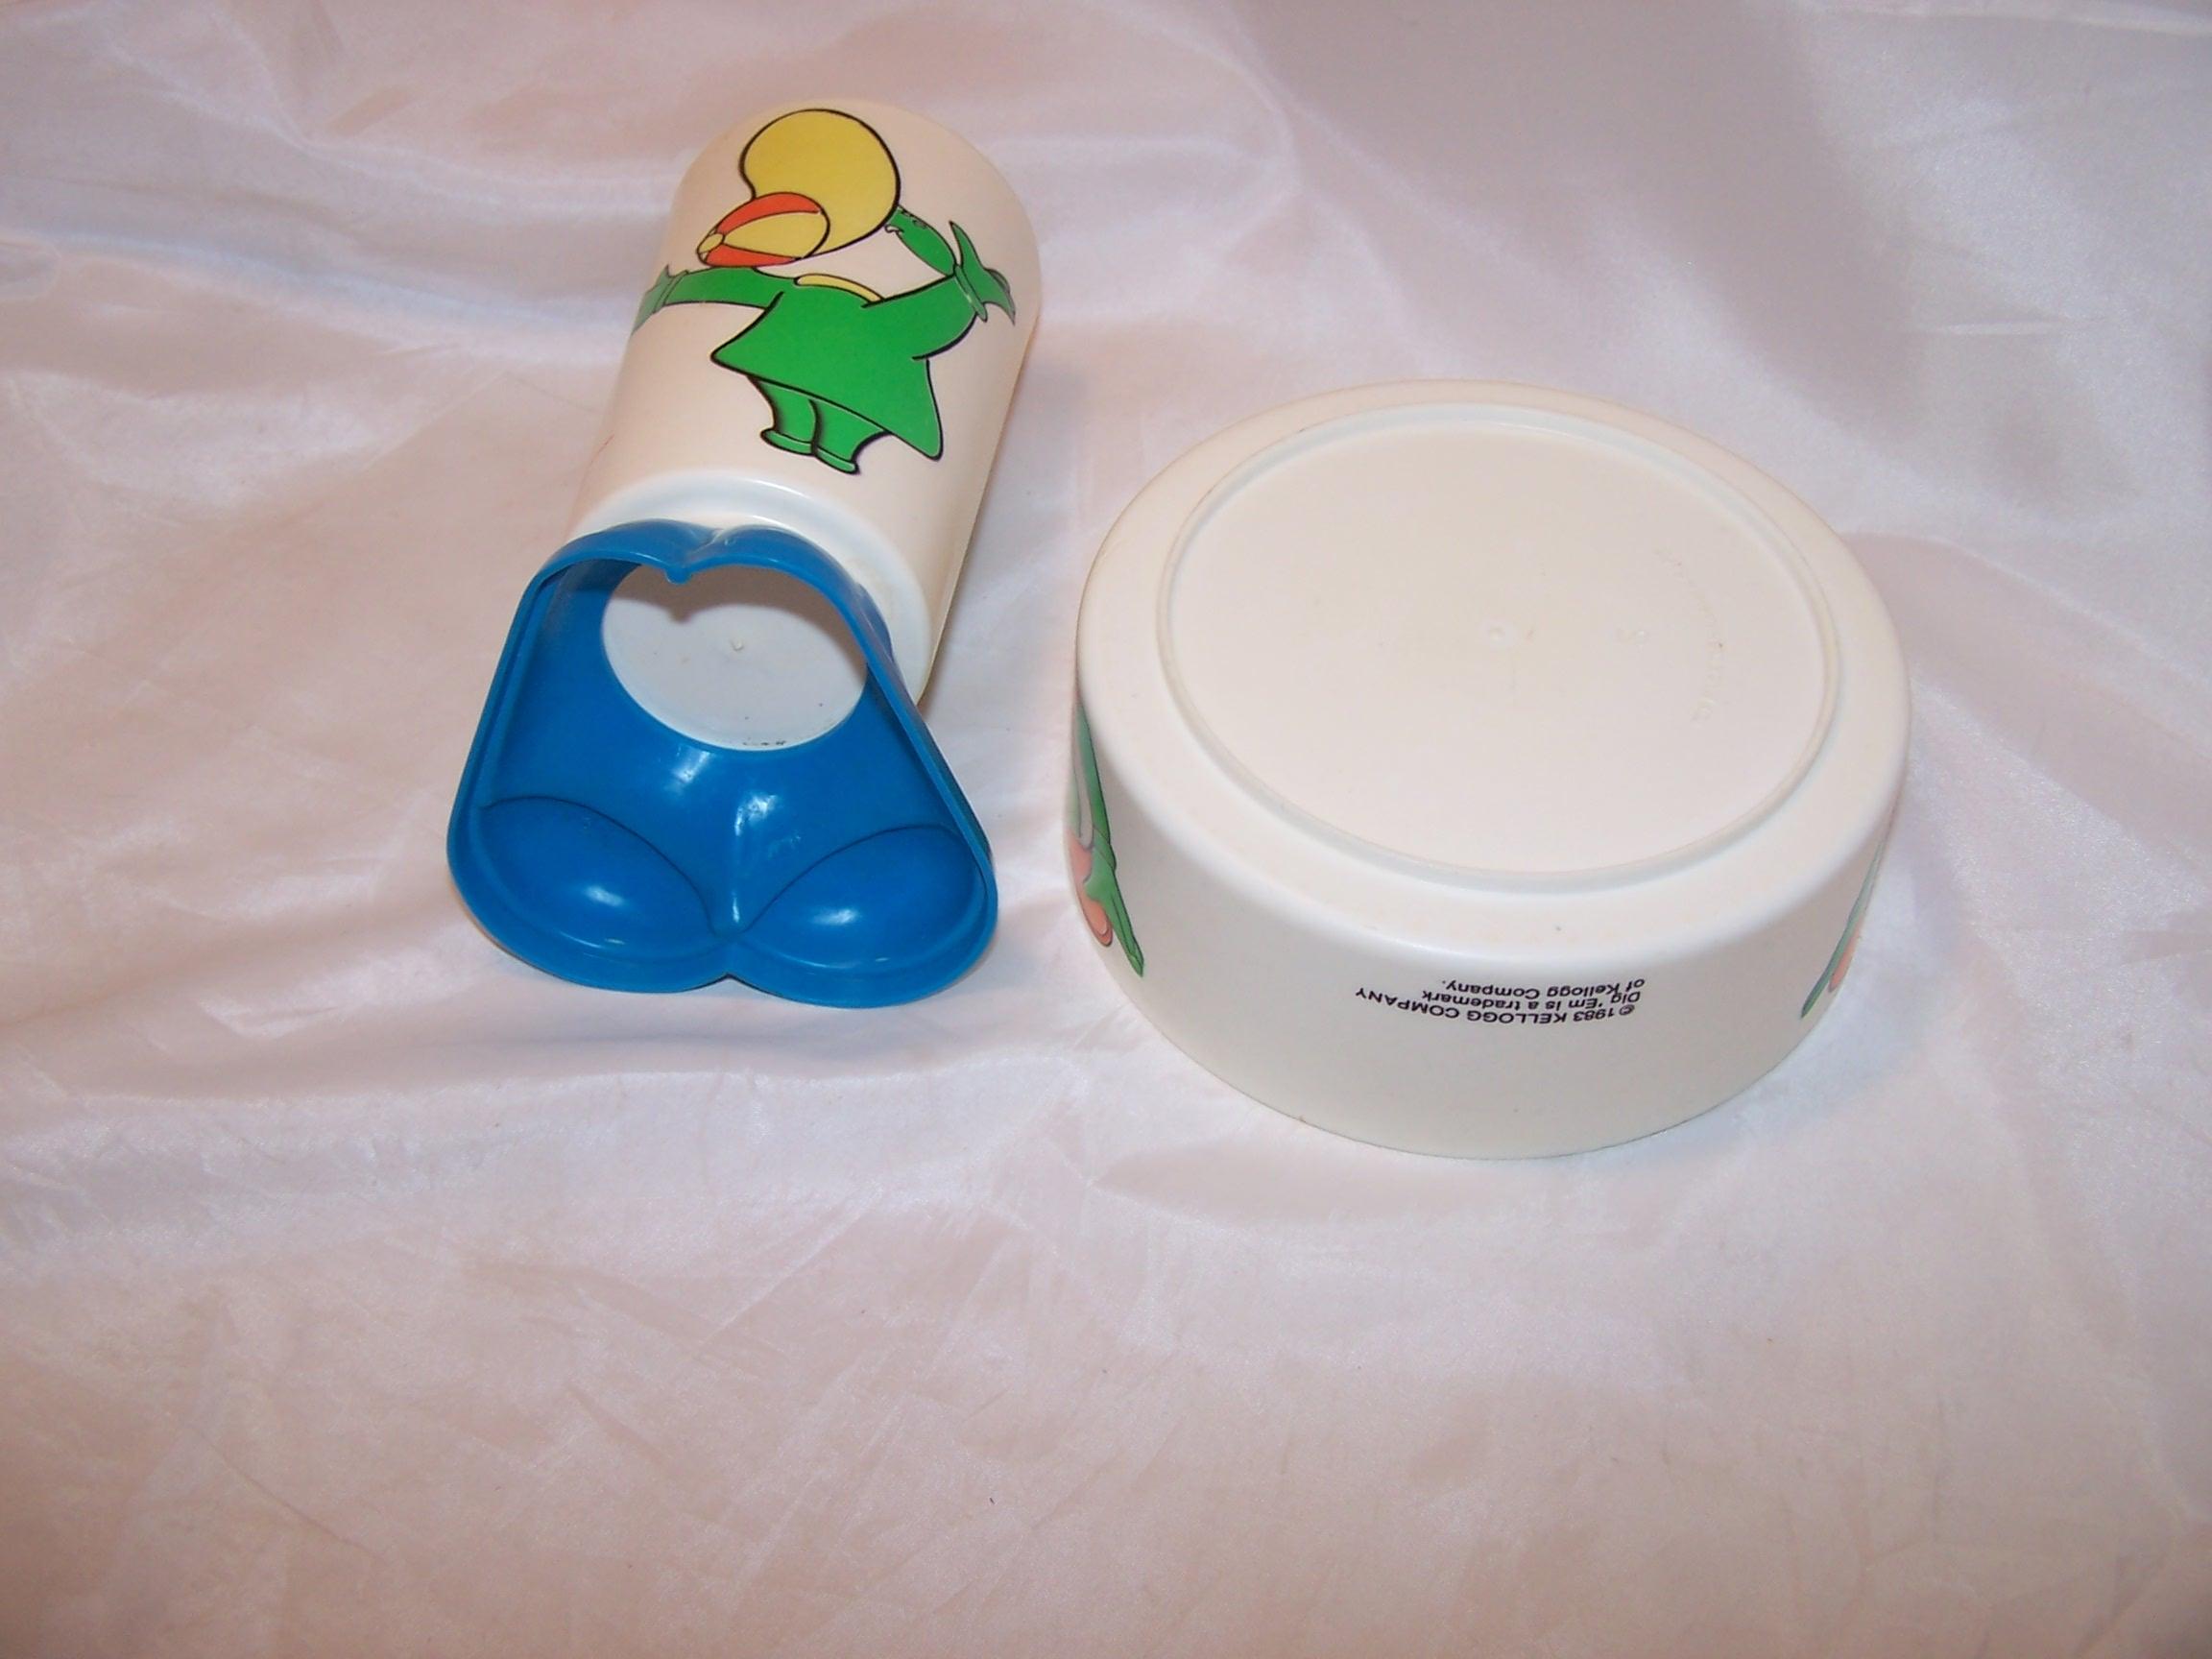 Image 6 of Kellogg Dig Em Cup and Bowl, Sugar Smacks, Plastic, 1980s